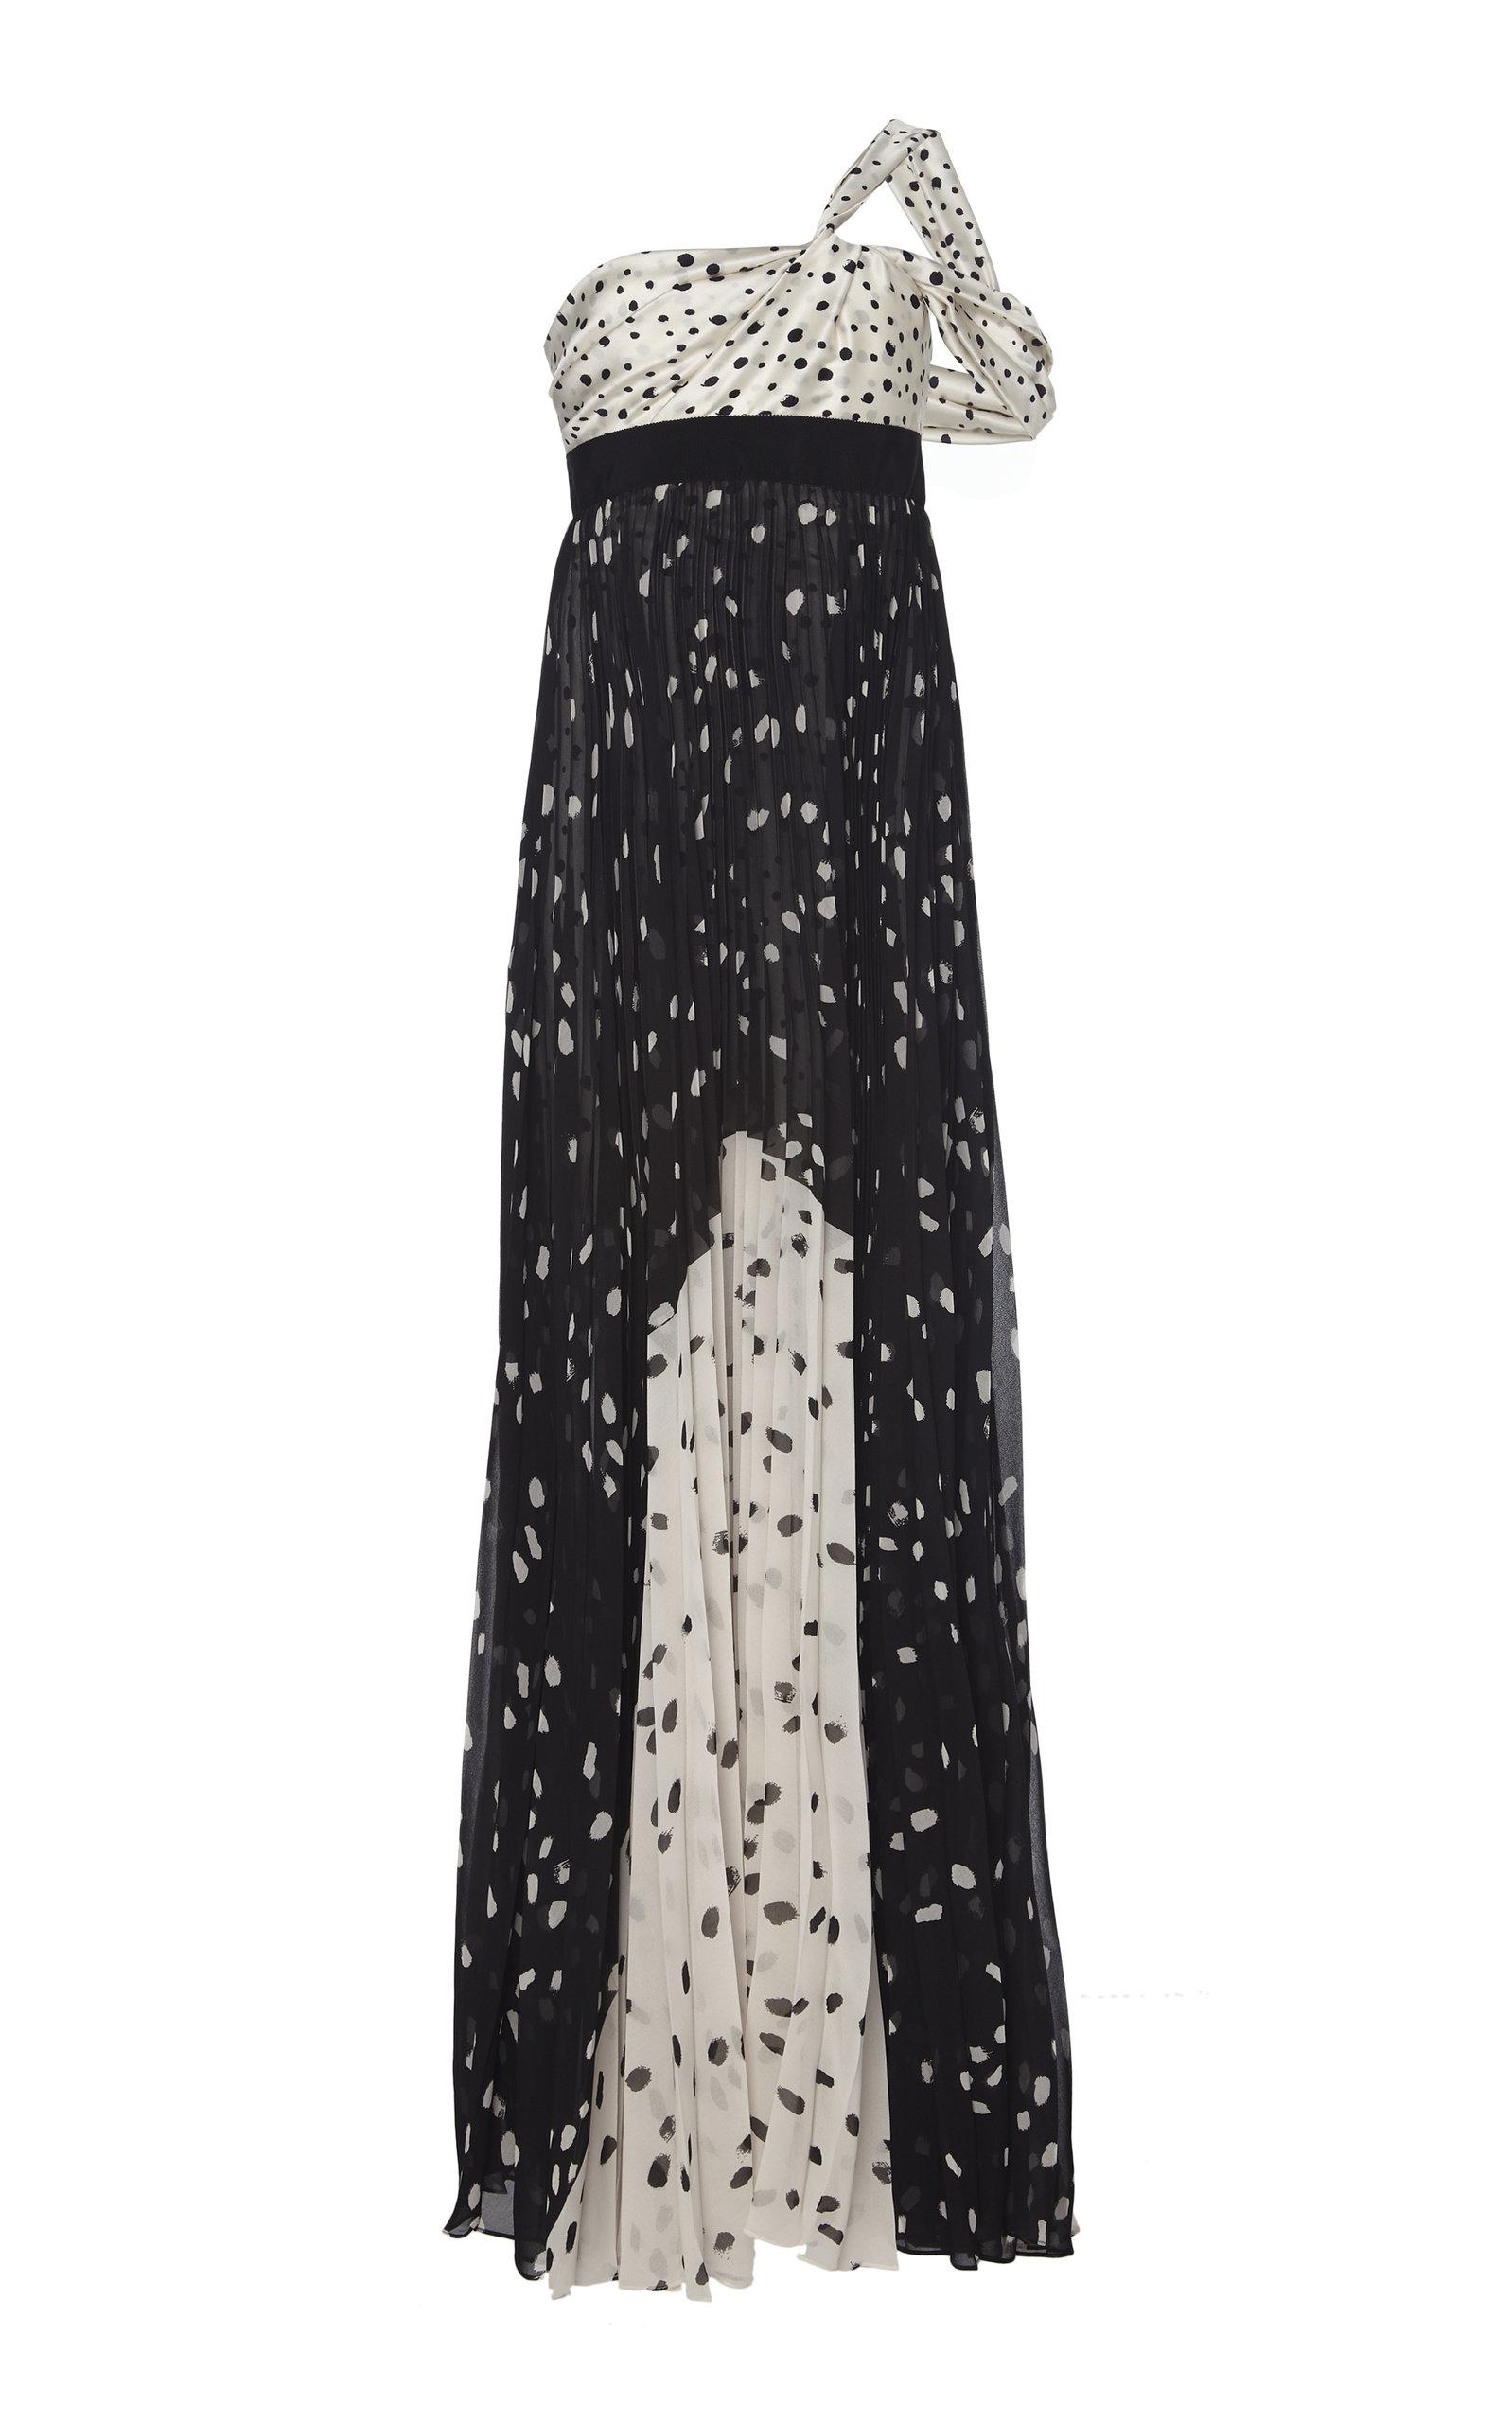 Buy Silvia Tcherassi Salgar Polka-Dot Satin-Paneled Silk-Chiffon Maxi Dres online, shop Silvia Tcherassi at the best price